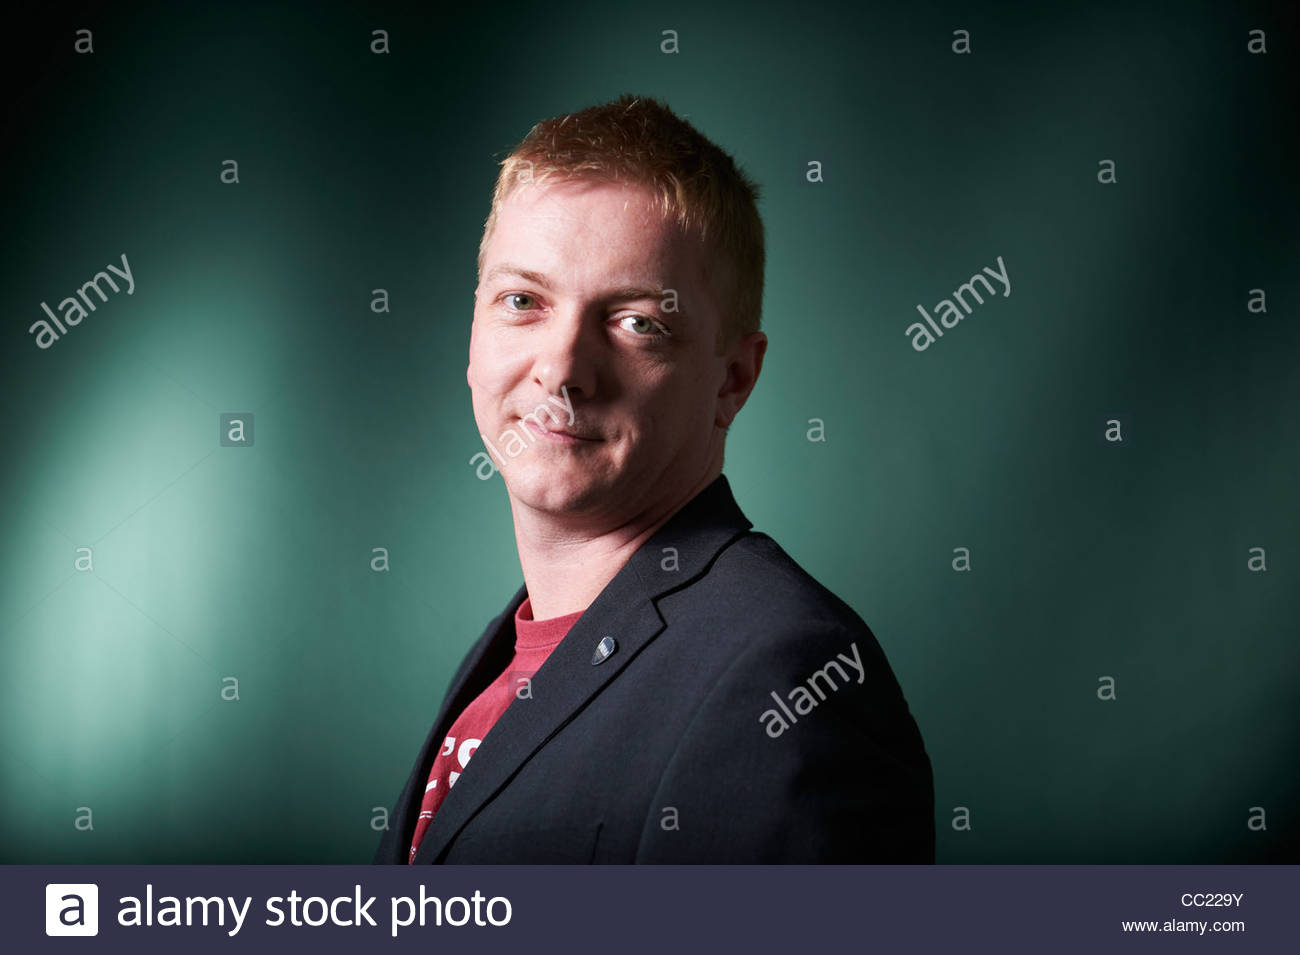 Doug Johnstone, Scottish Novelist and writer at The Edinburgh International Book Festival 2011. - Stock Image